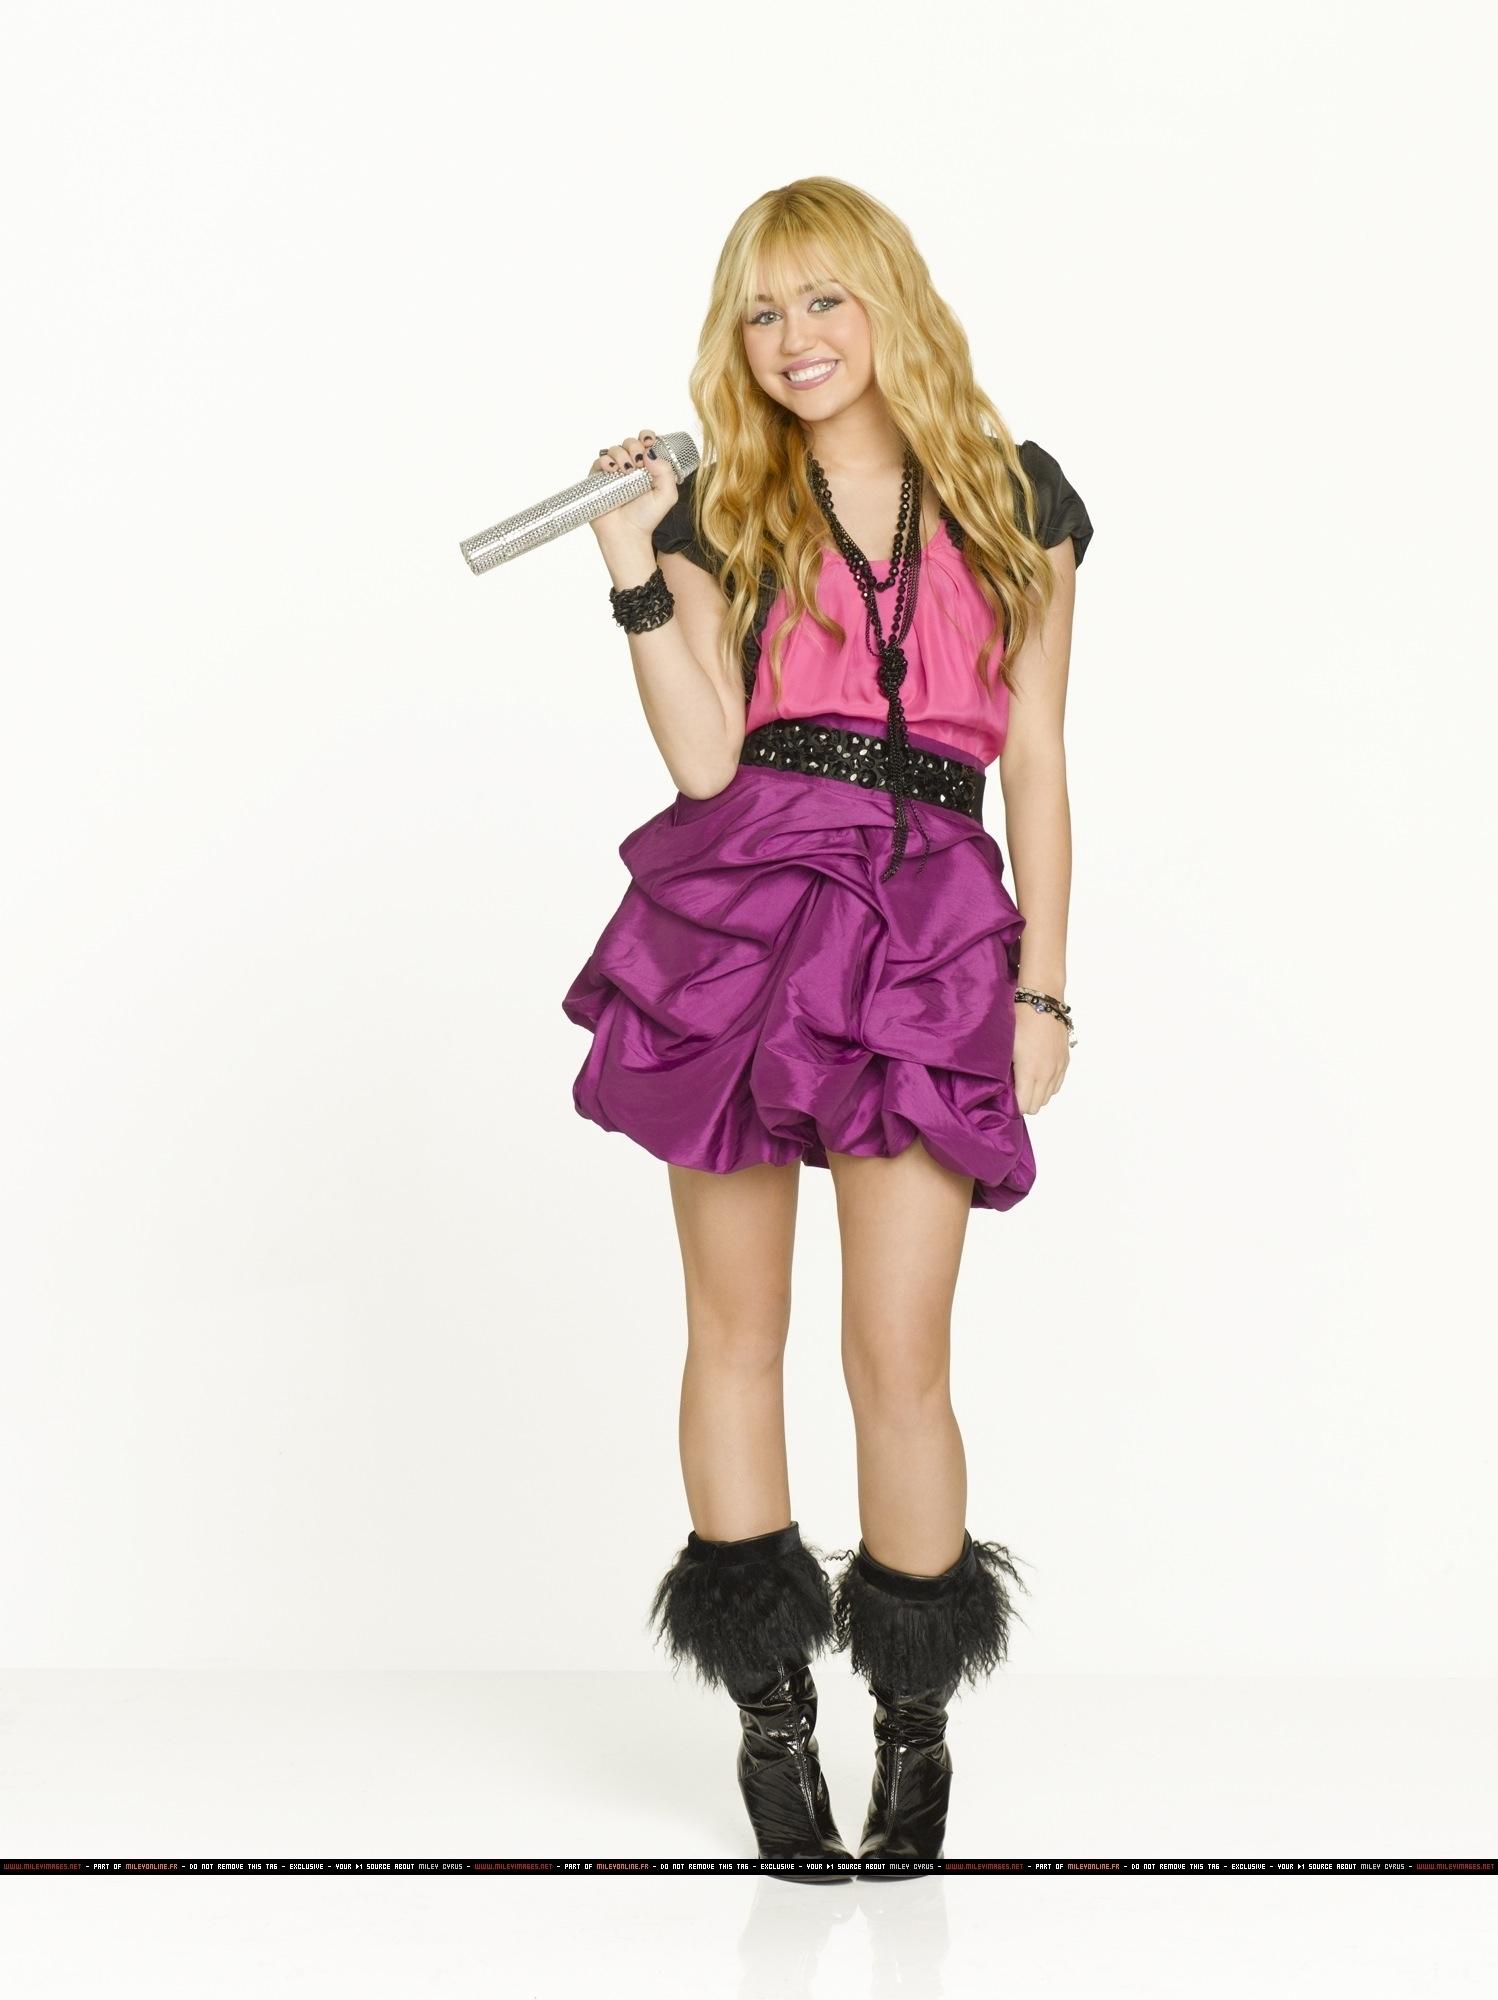 Hannah Montana - Wallpaper